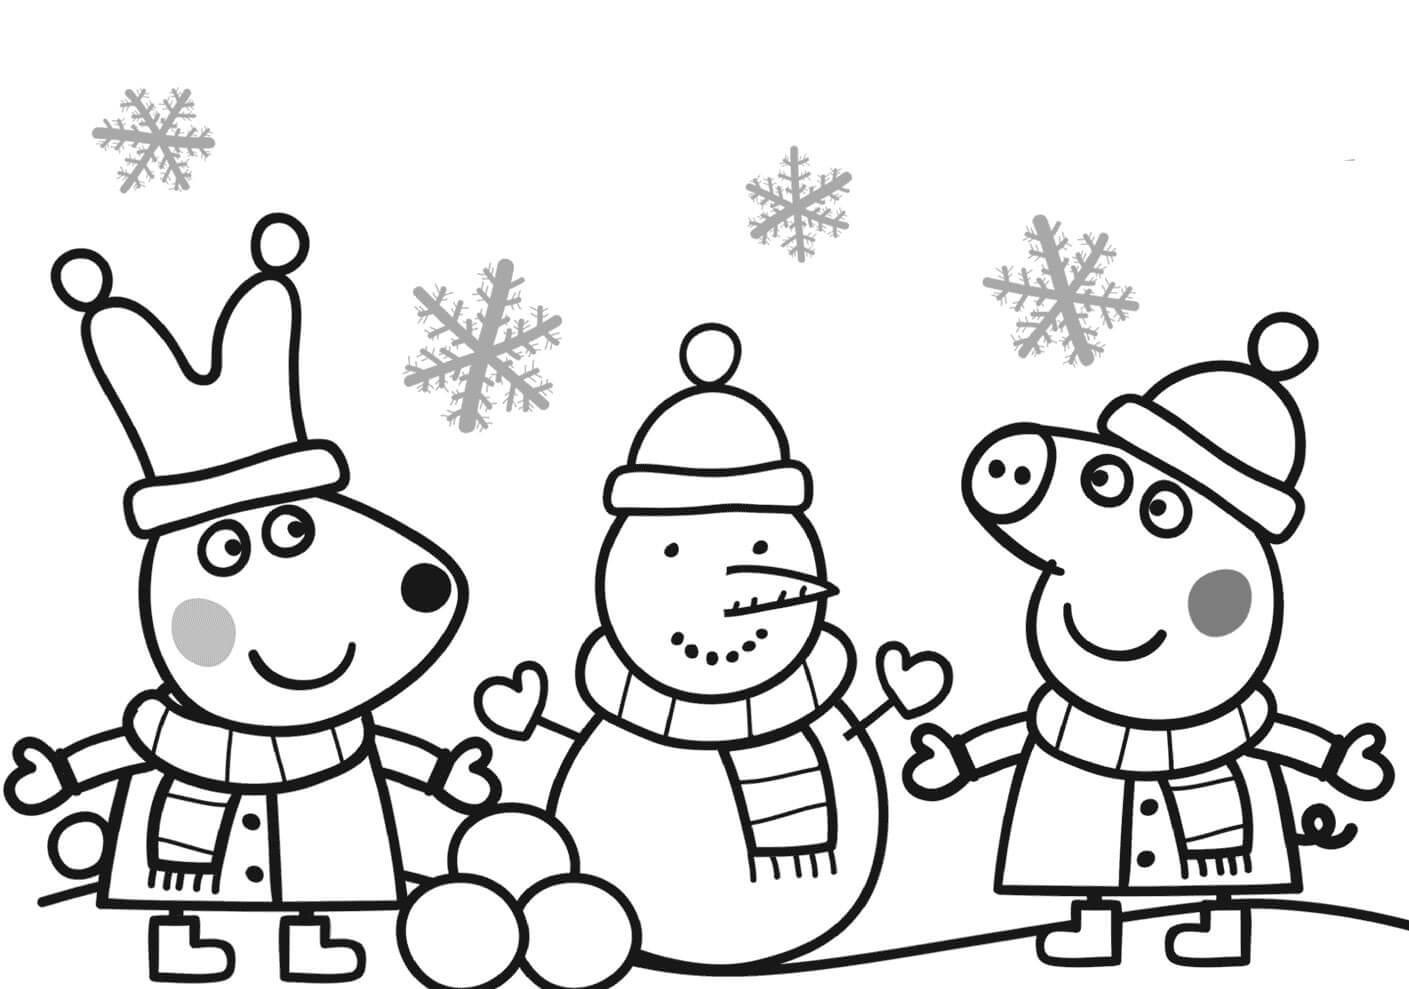 peppa-pig-coloring-pages-christmas-of-peppa-pig-coloring-pages-christmas Peppa Pig Coloring Pages Christmas Cartoon